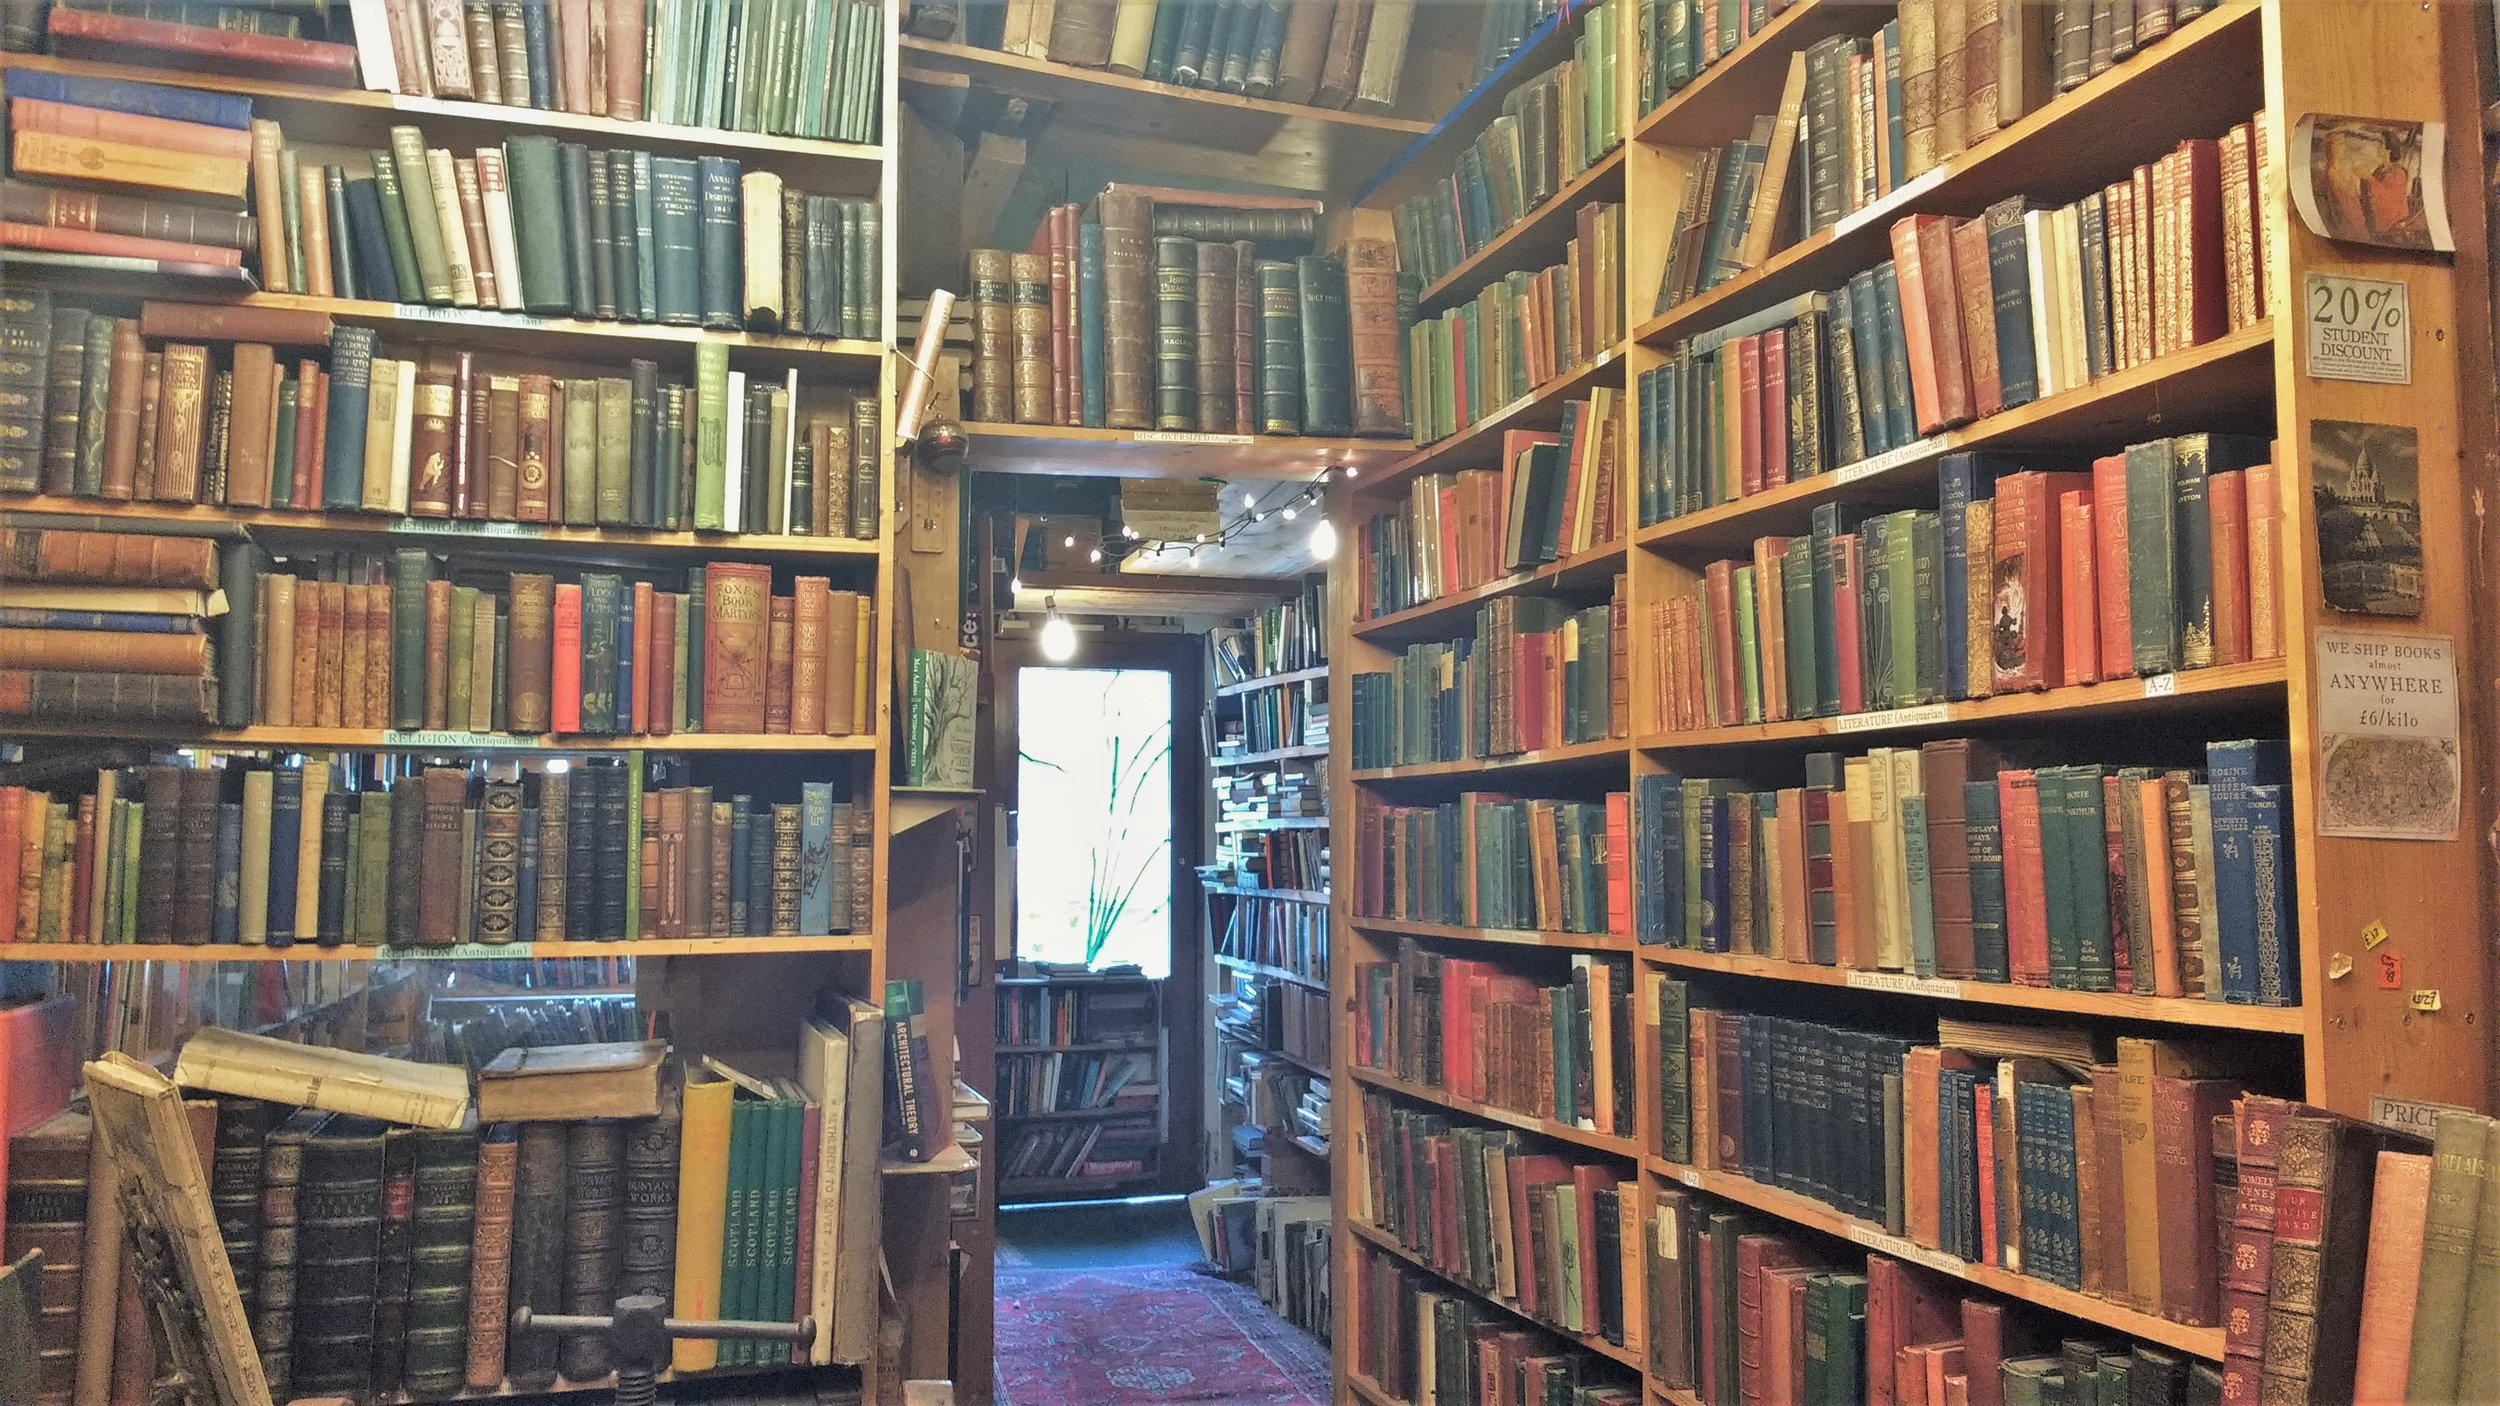 Armchair books best bookstores in Edinburgh